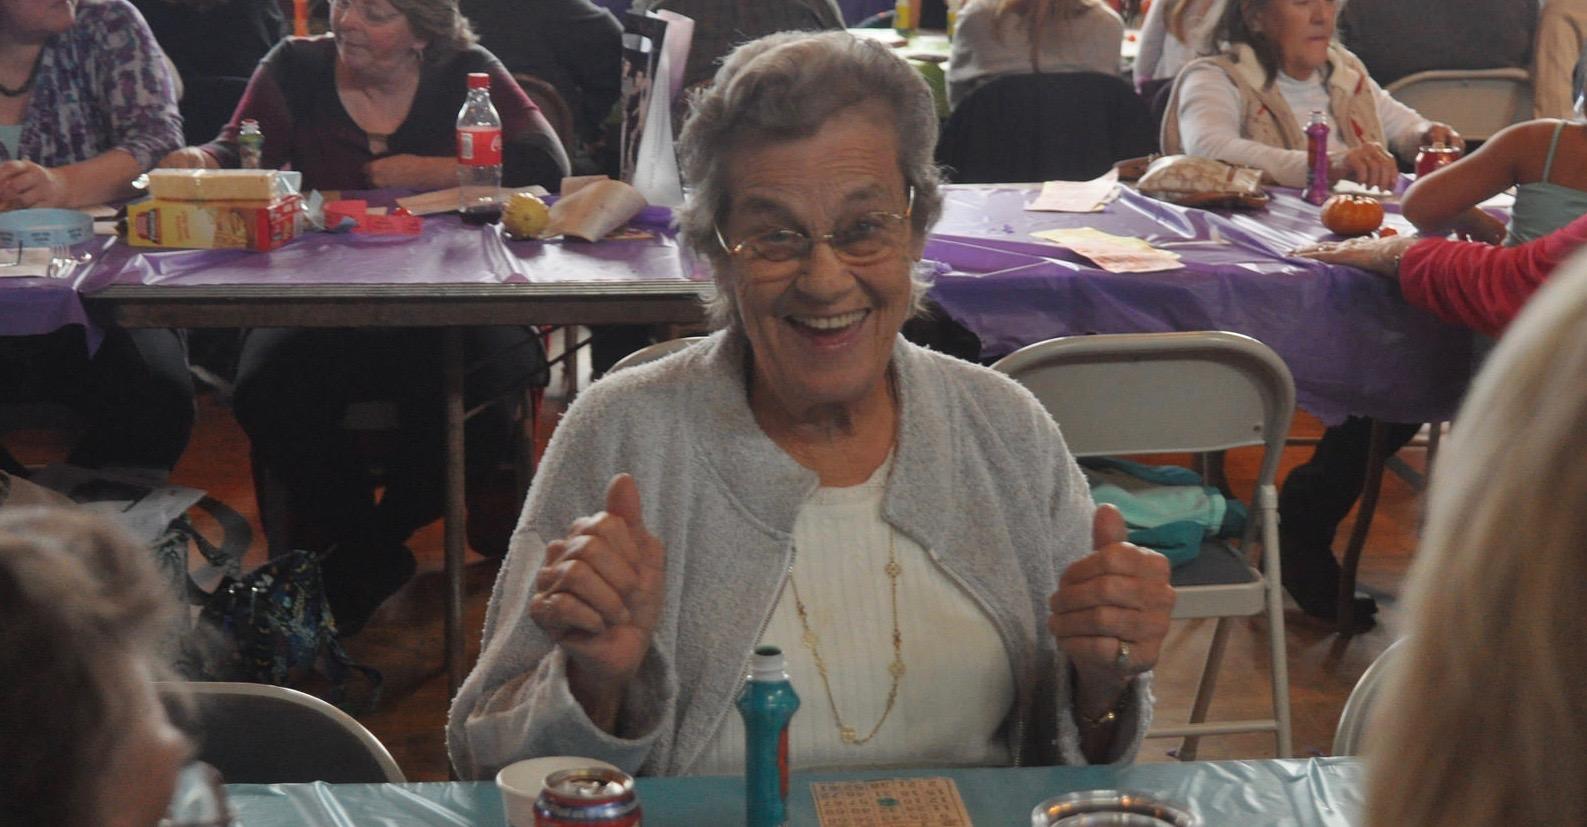 Older woman having fun at Bingo night